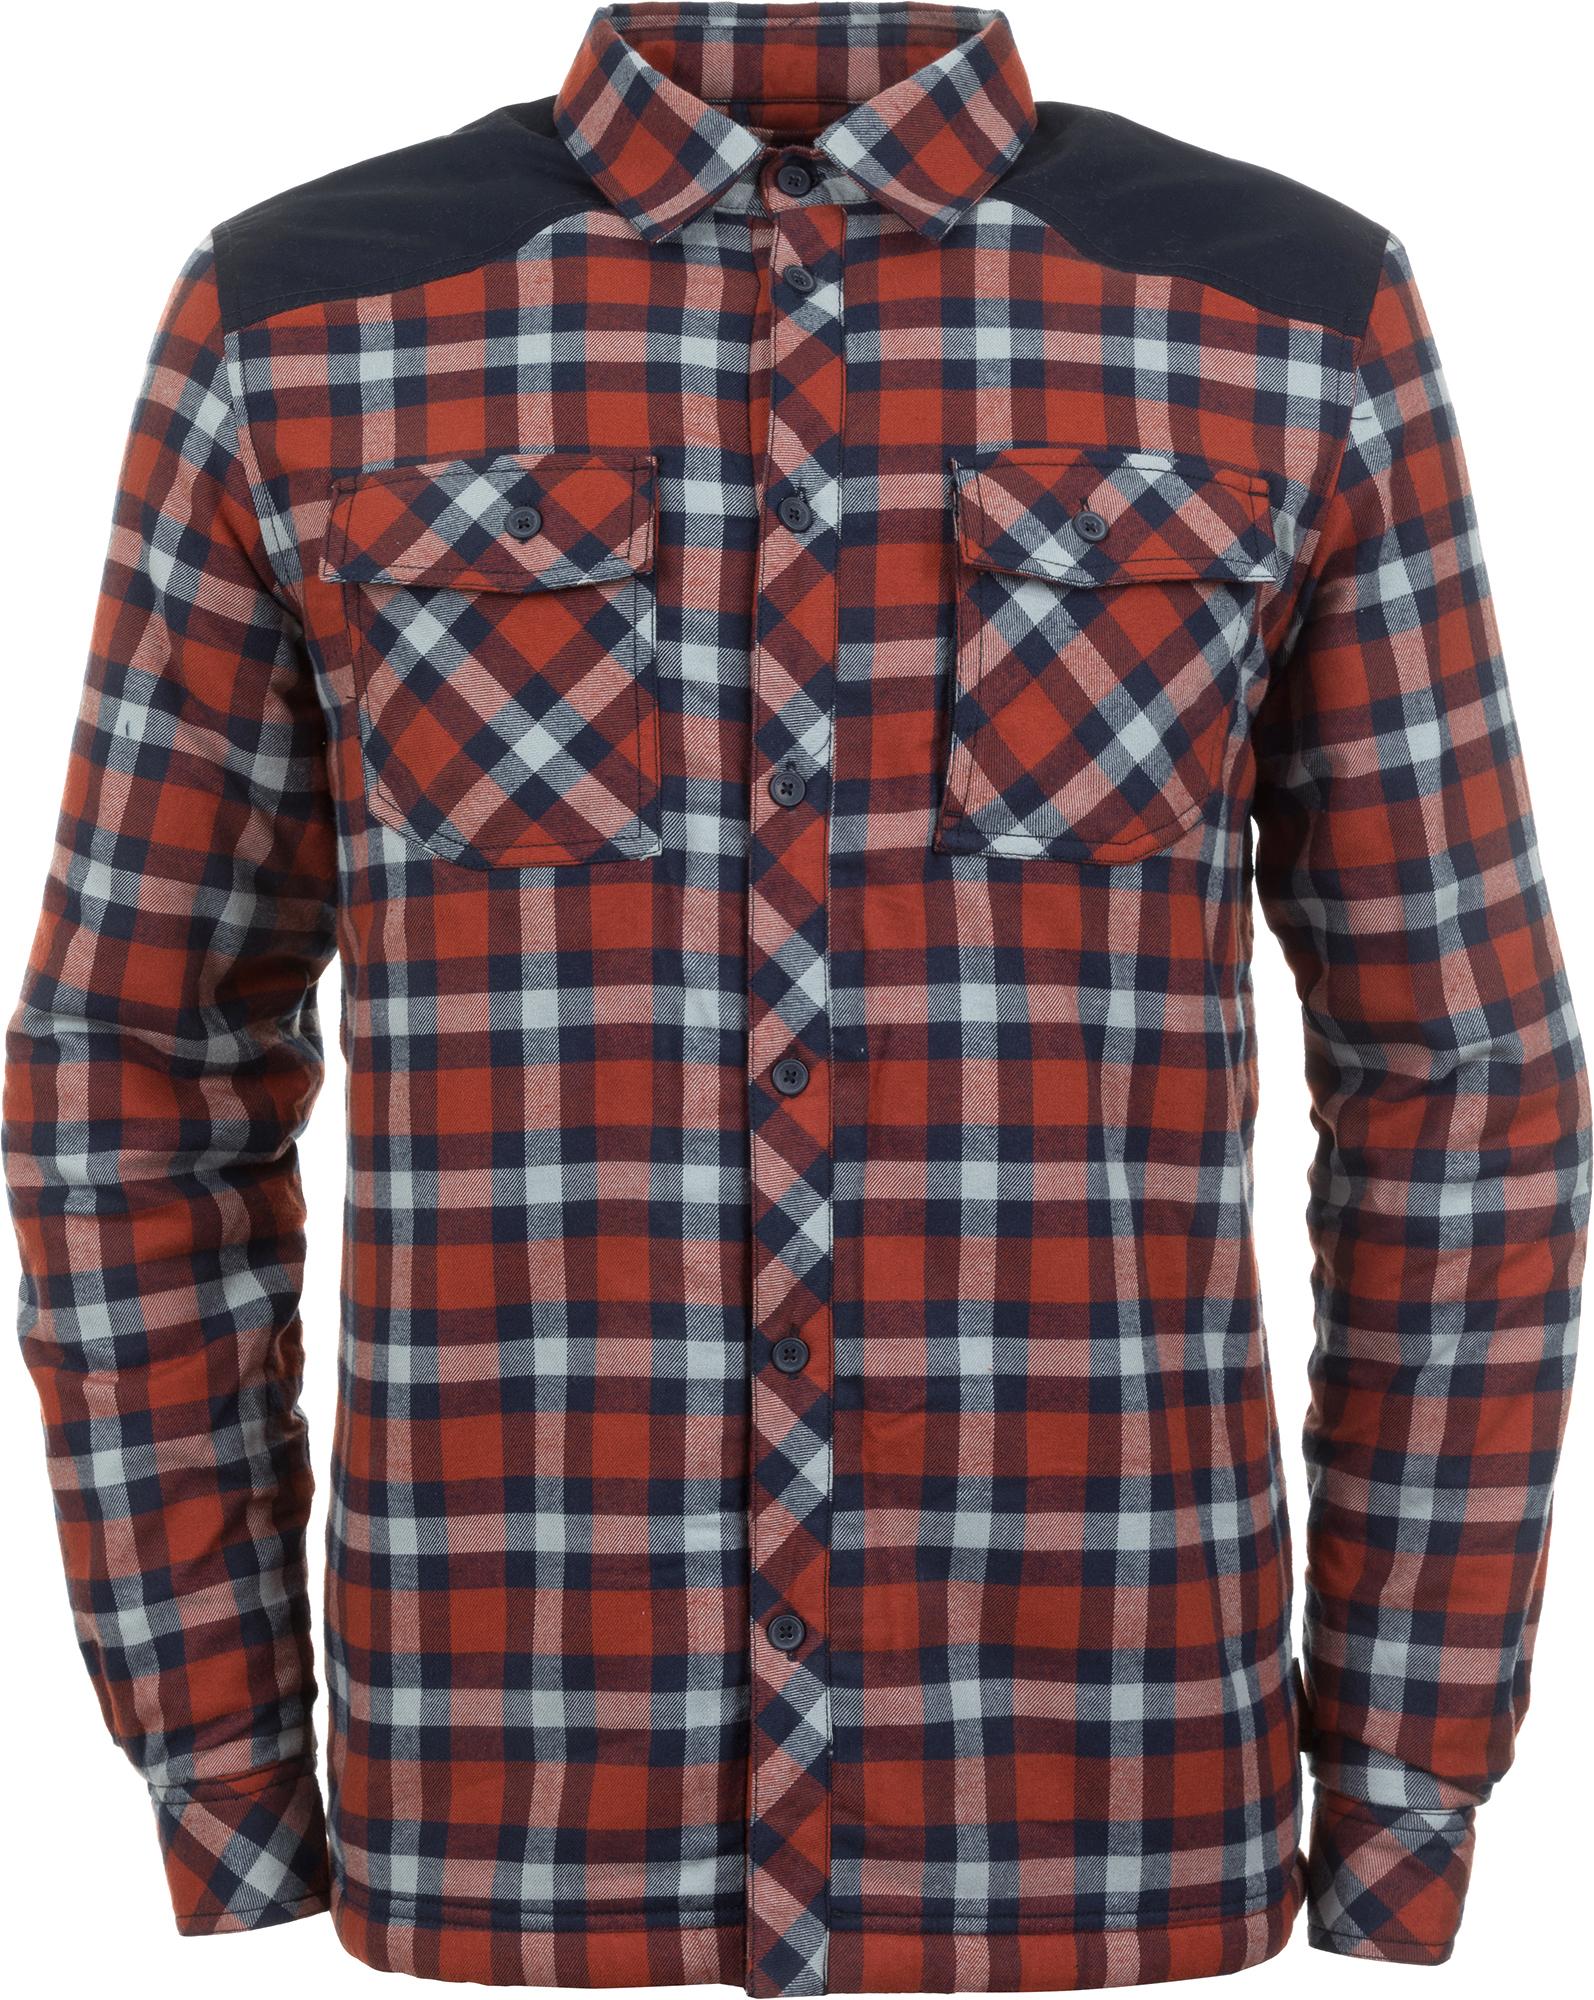 Outventure Рубашка с длинным рукавом мужская Outventure, размер 60